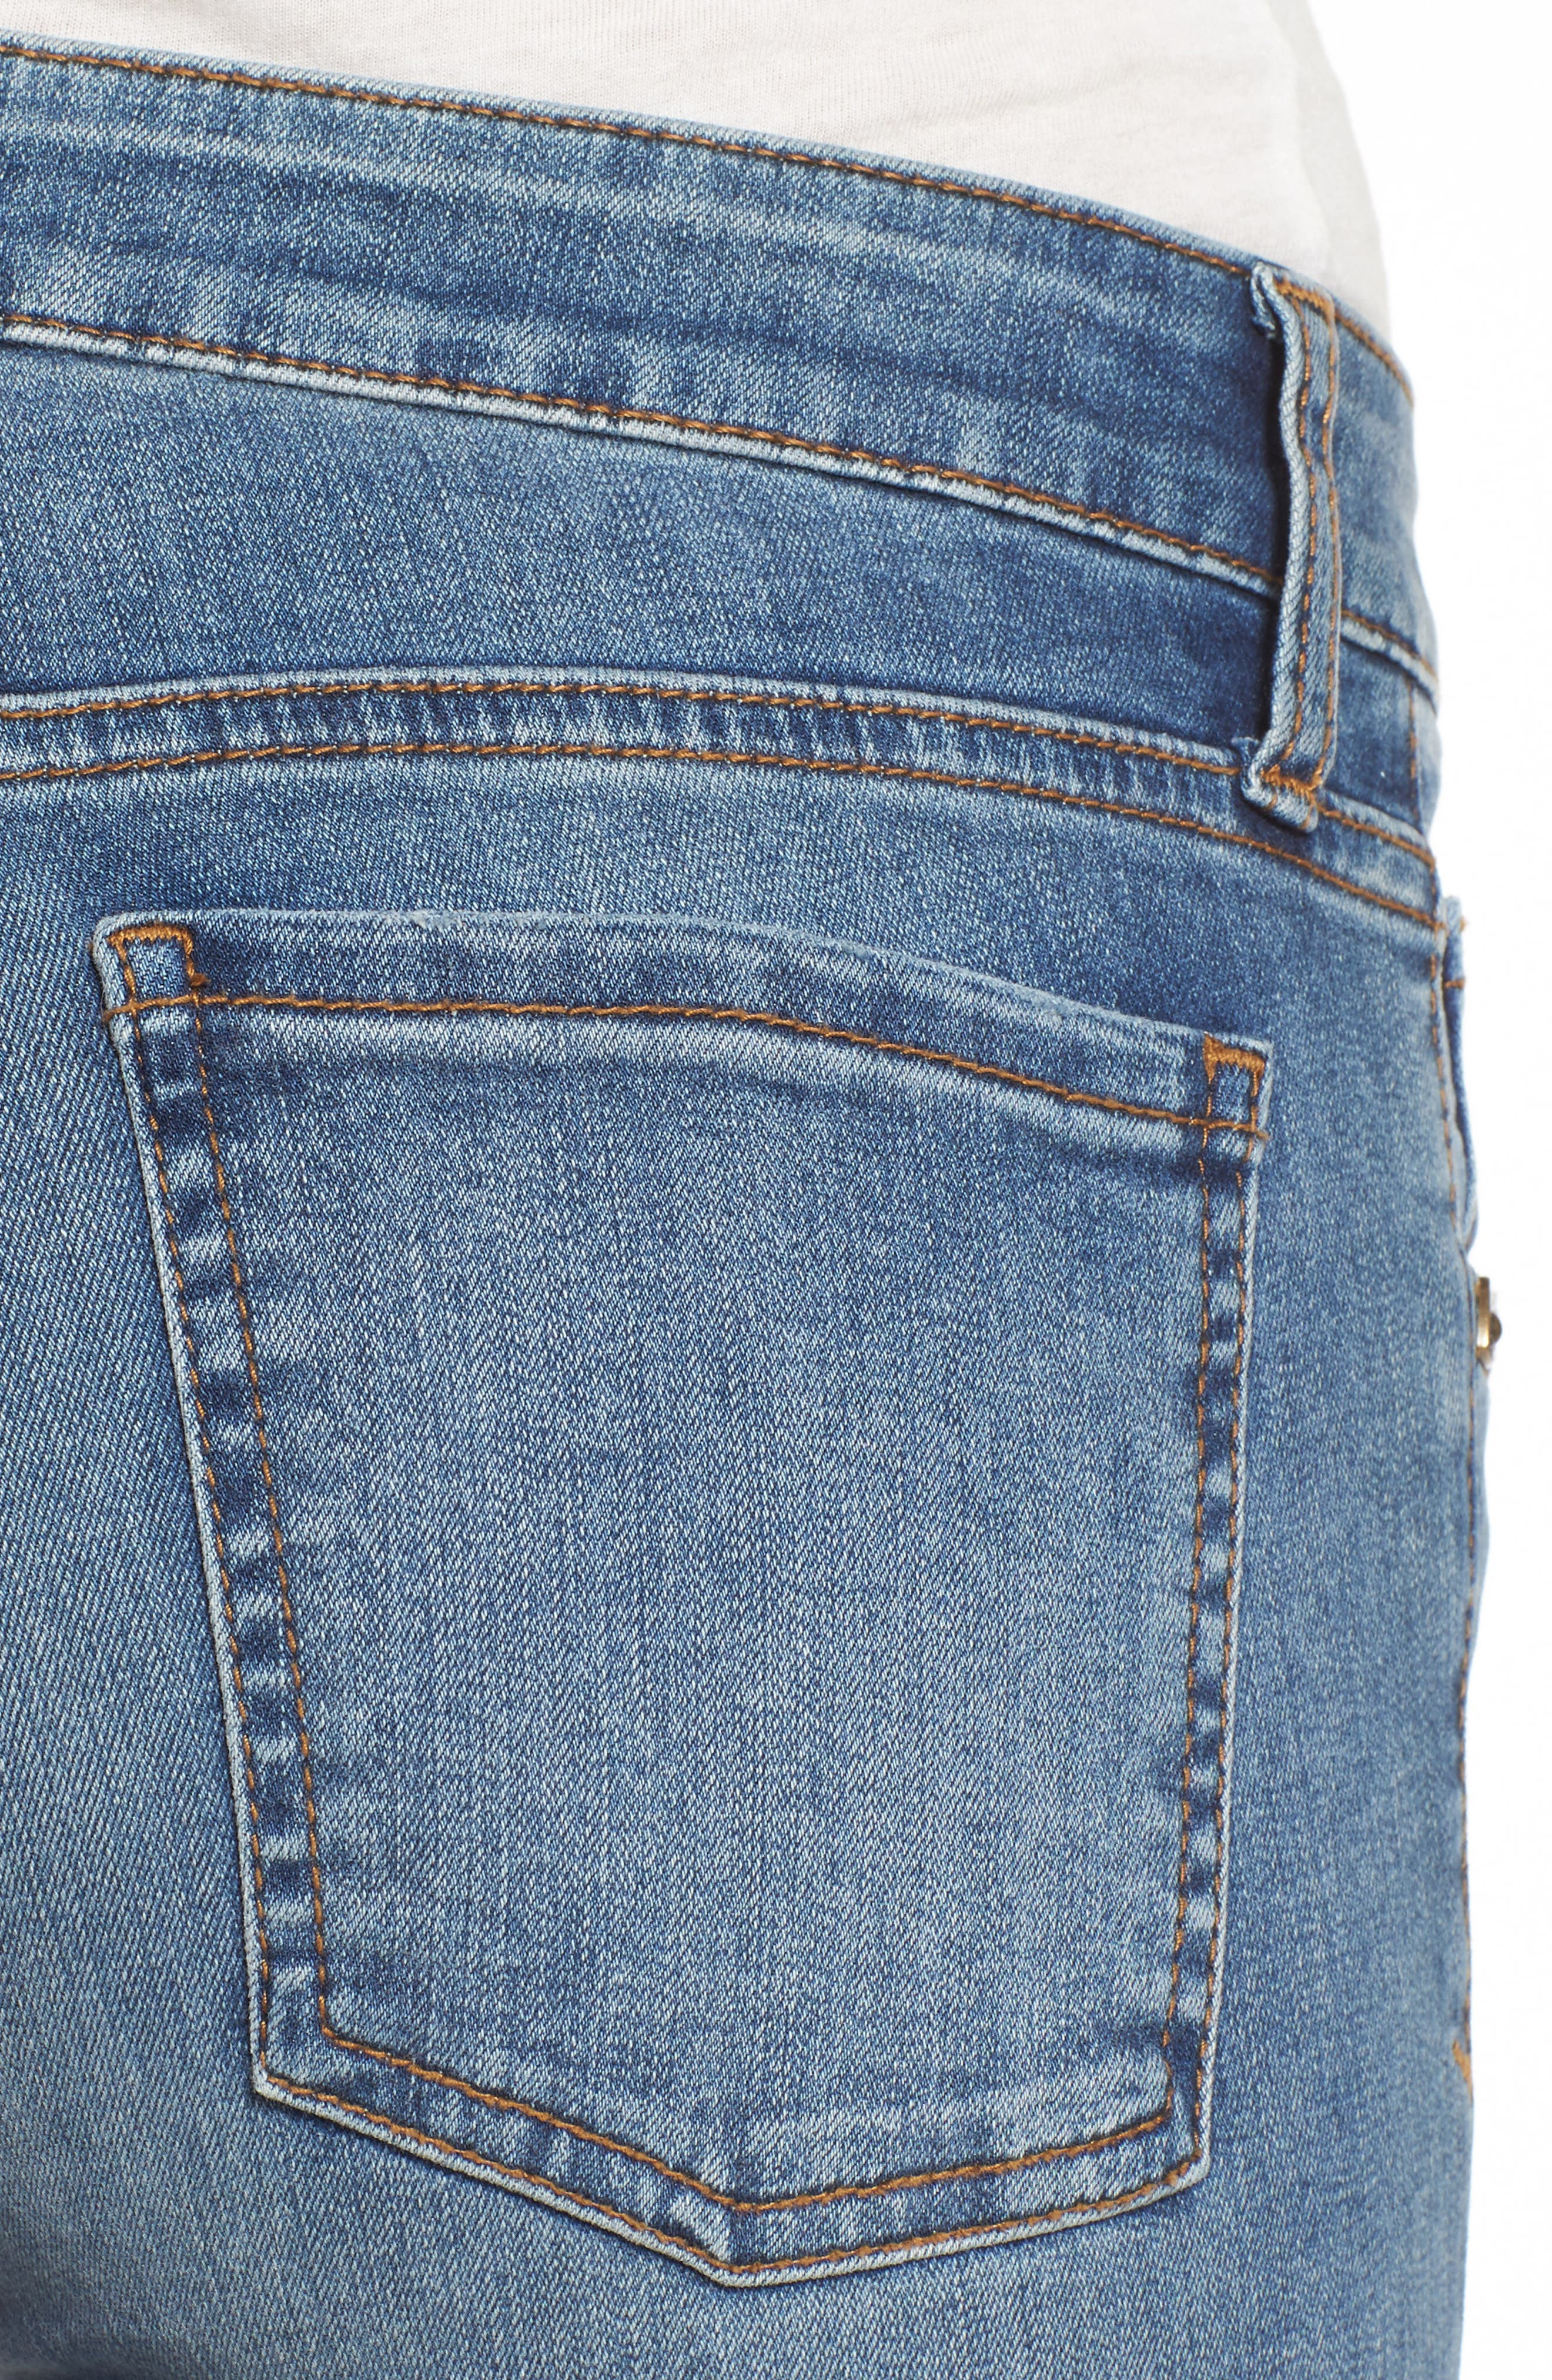 Donna Skinny Jeans,                             Alternate thumbnail 4, color,                             426